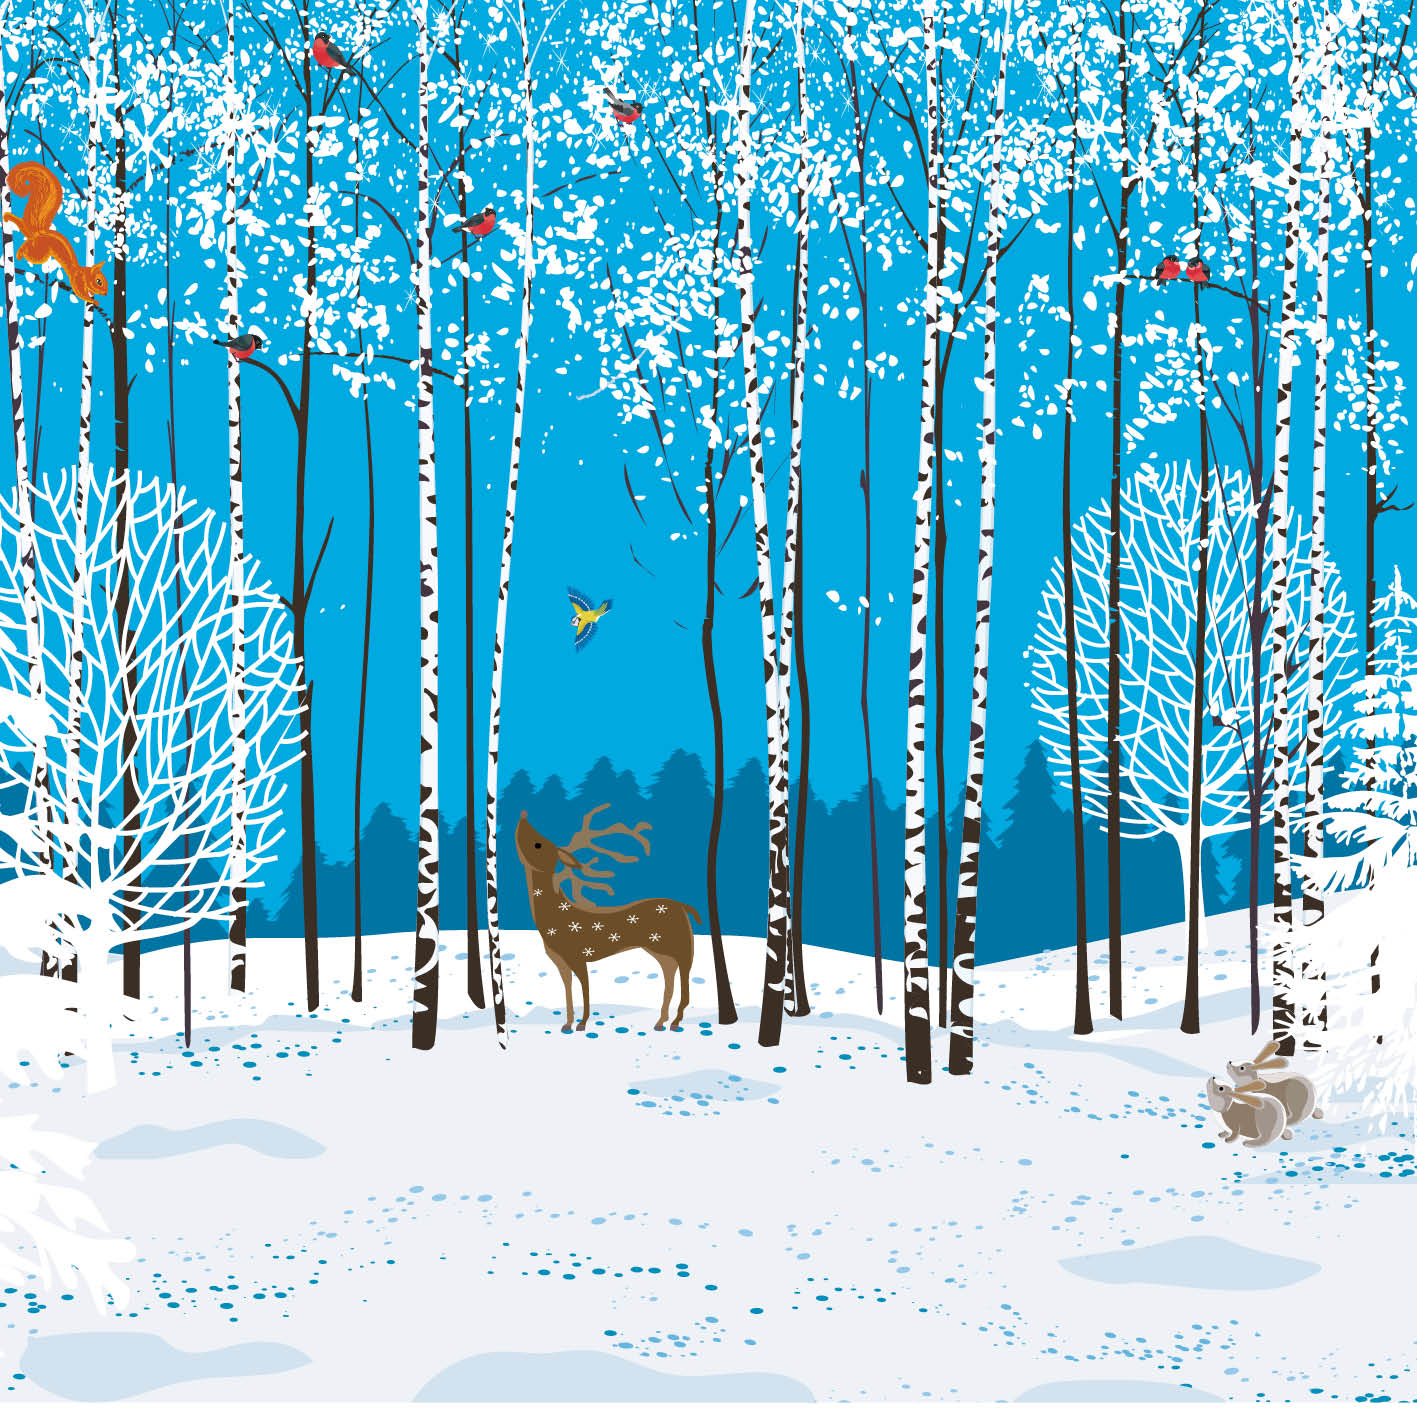 Woodland Creatures - Christmas Card